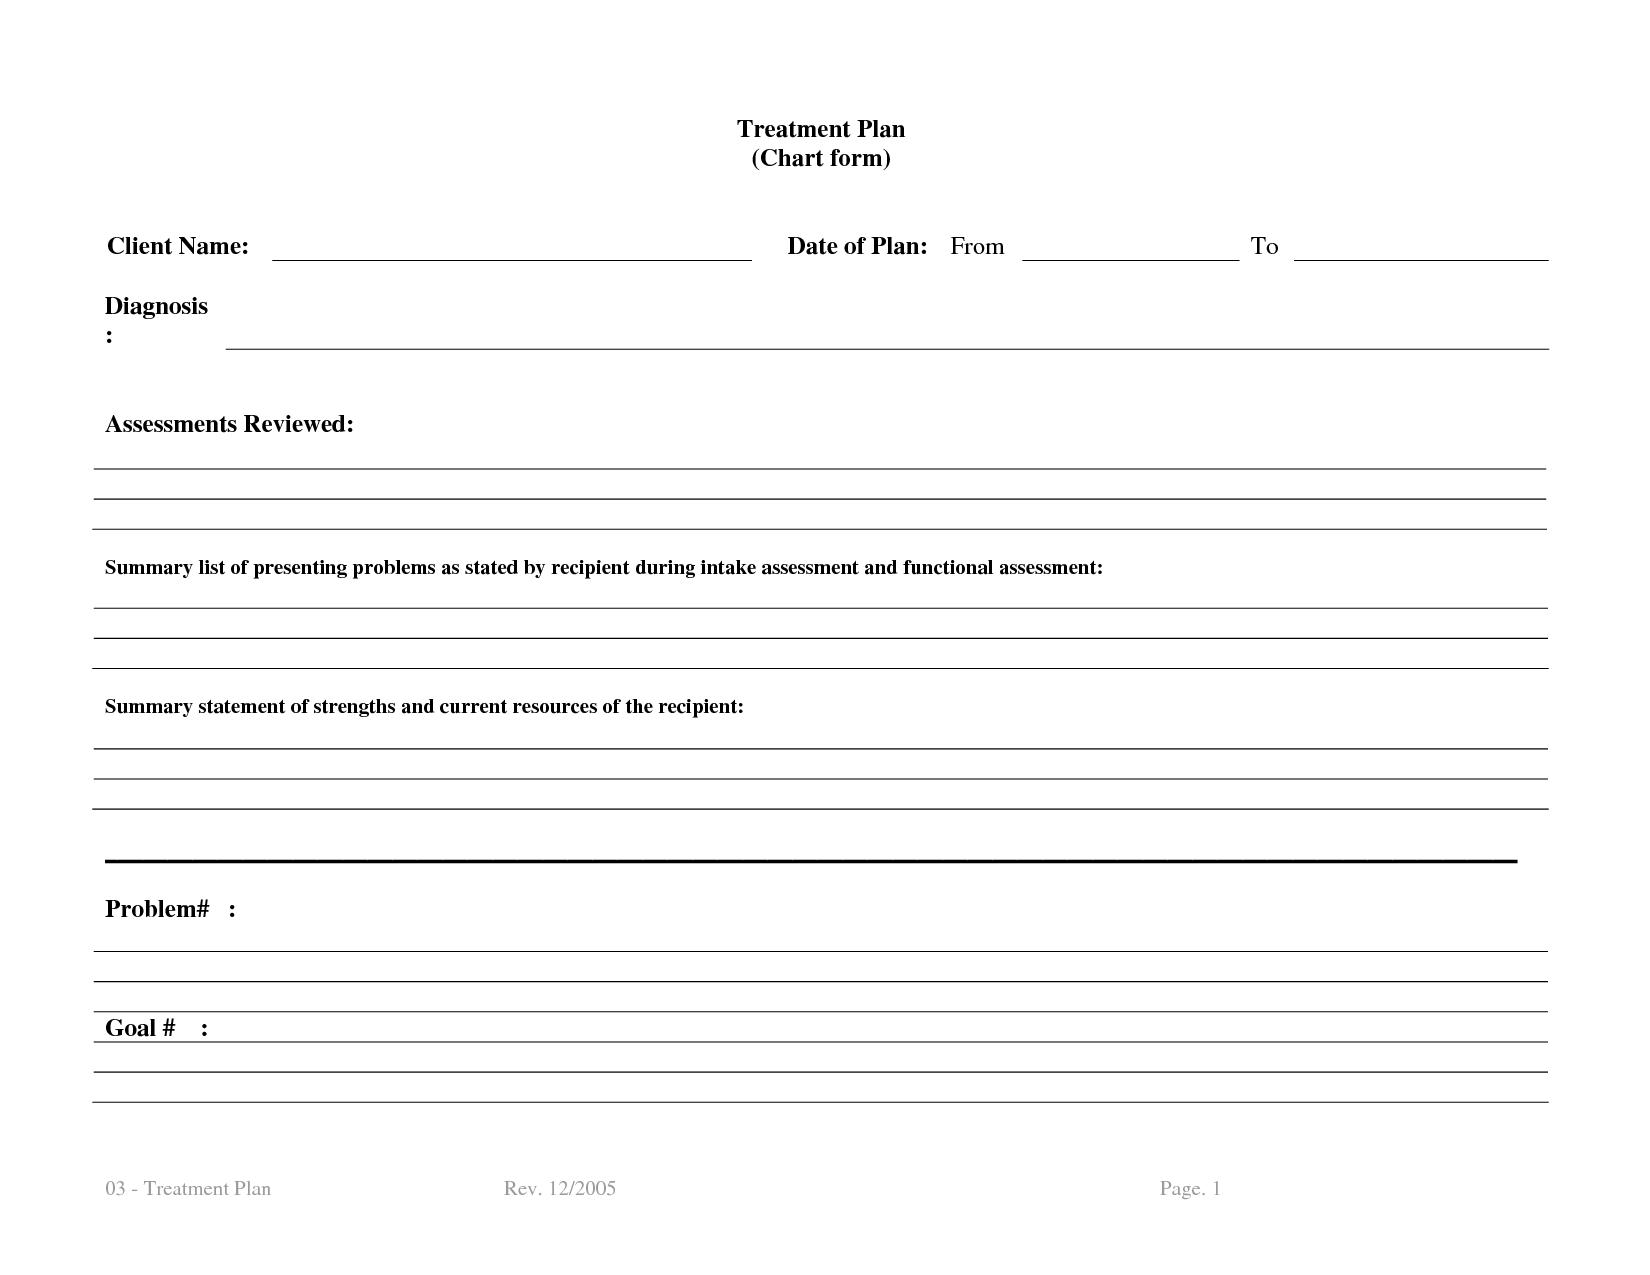 treatment plan template Bm4UCNTx   Therapy   Pinterest